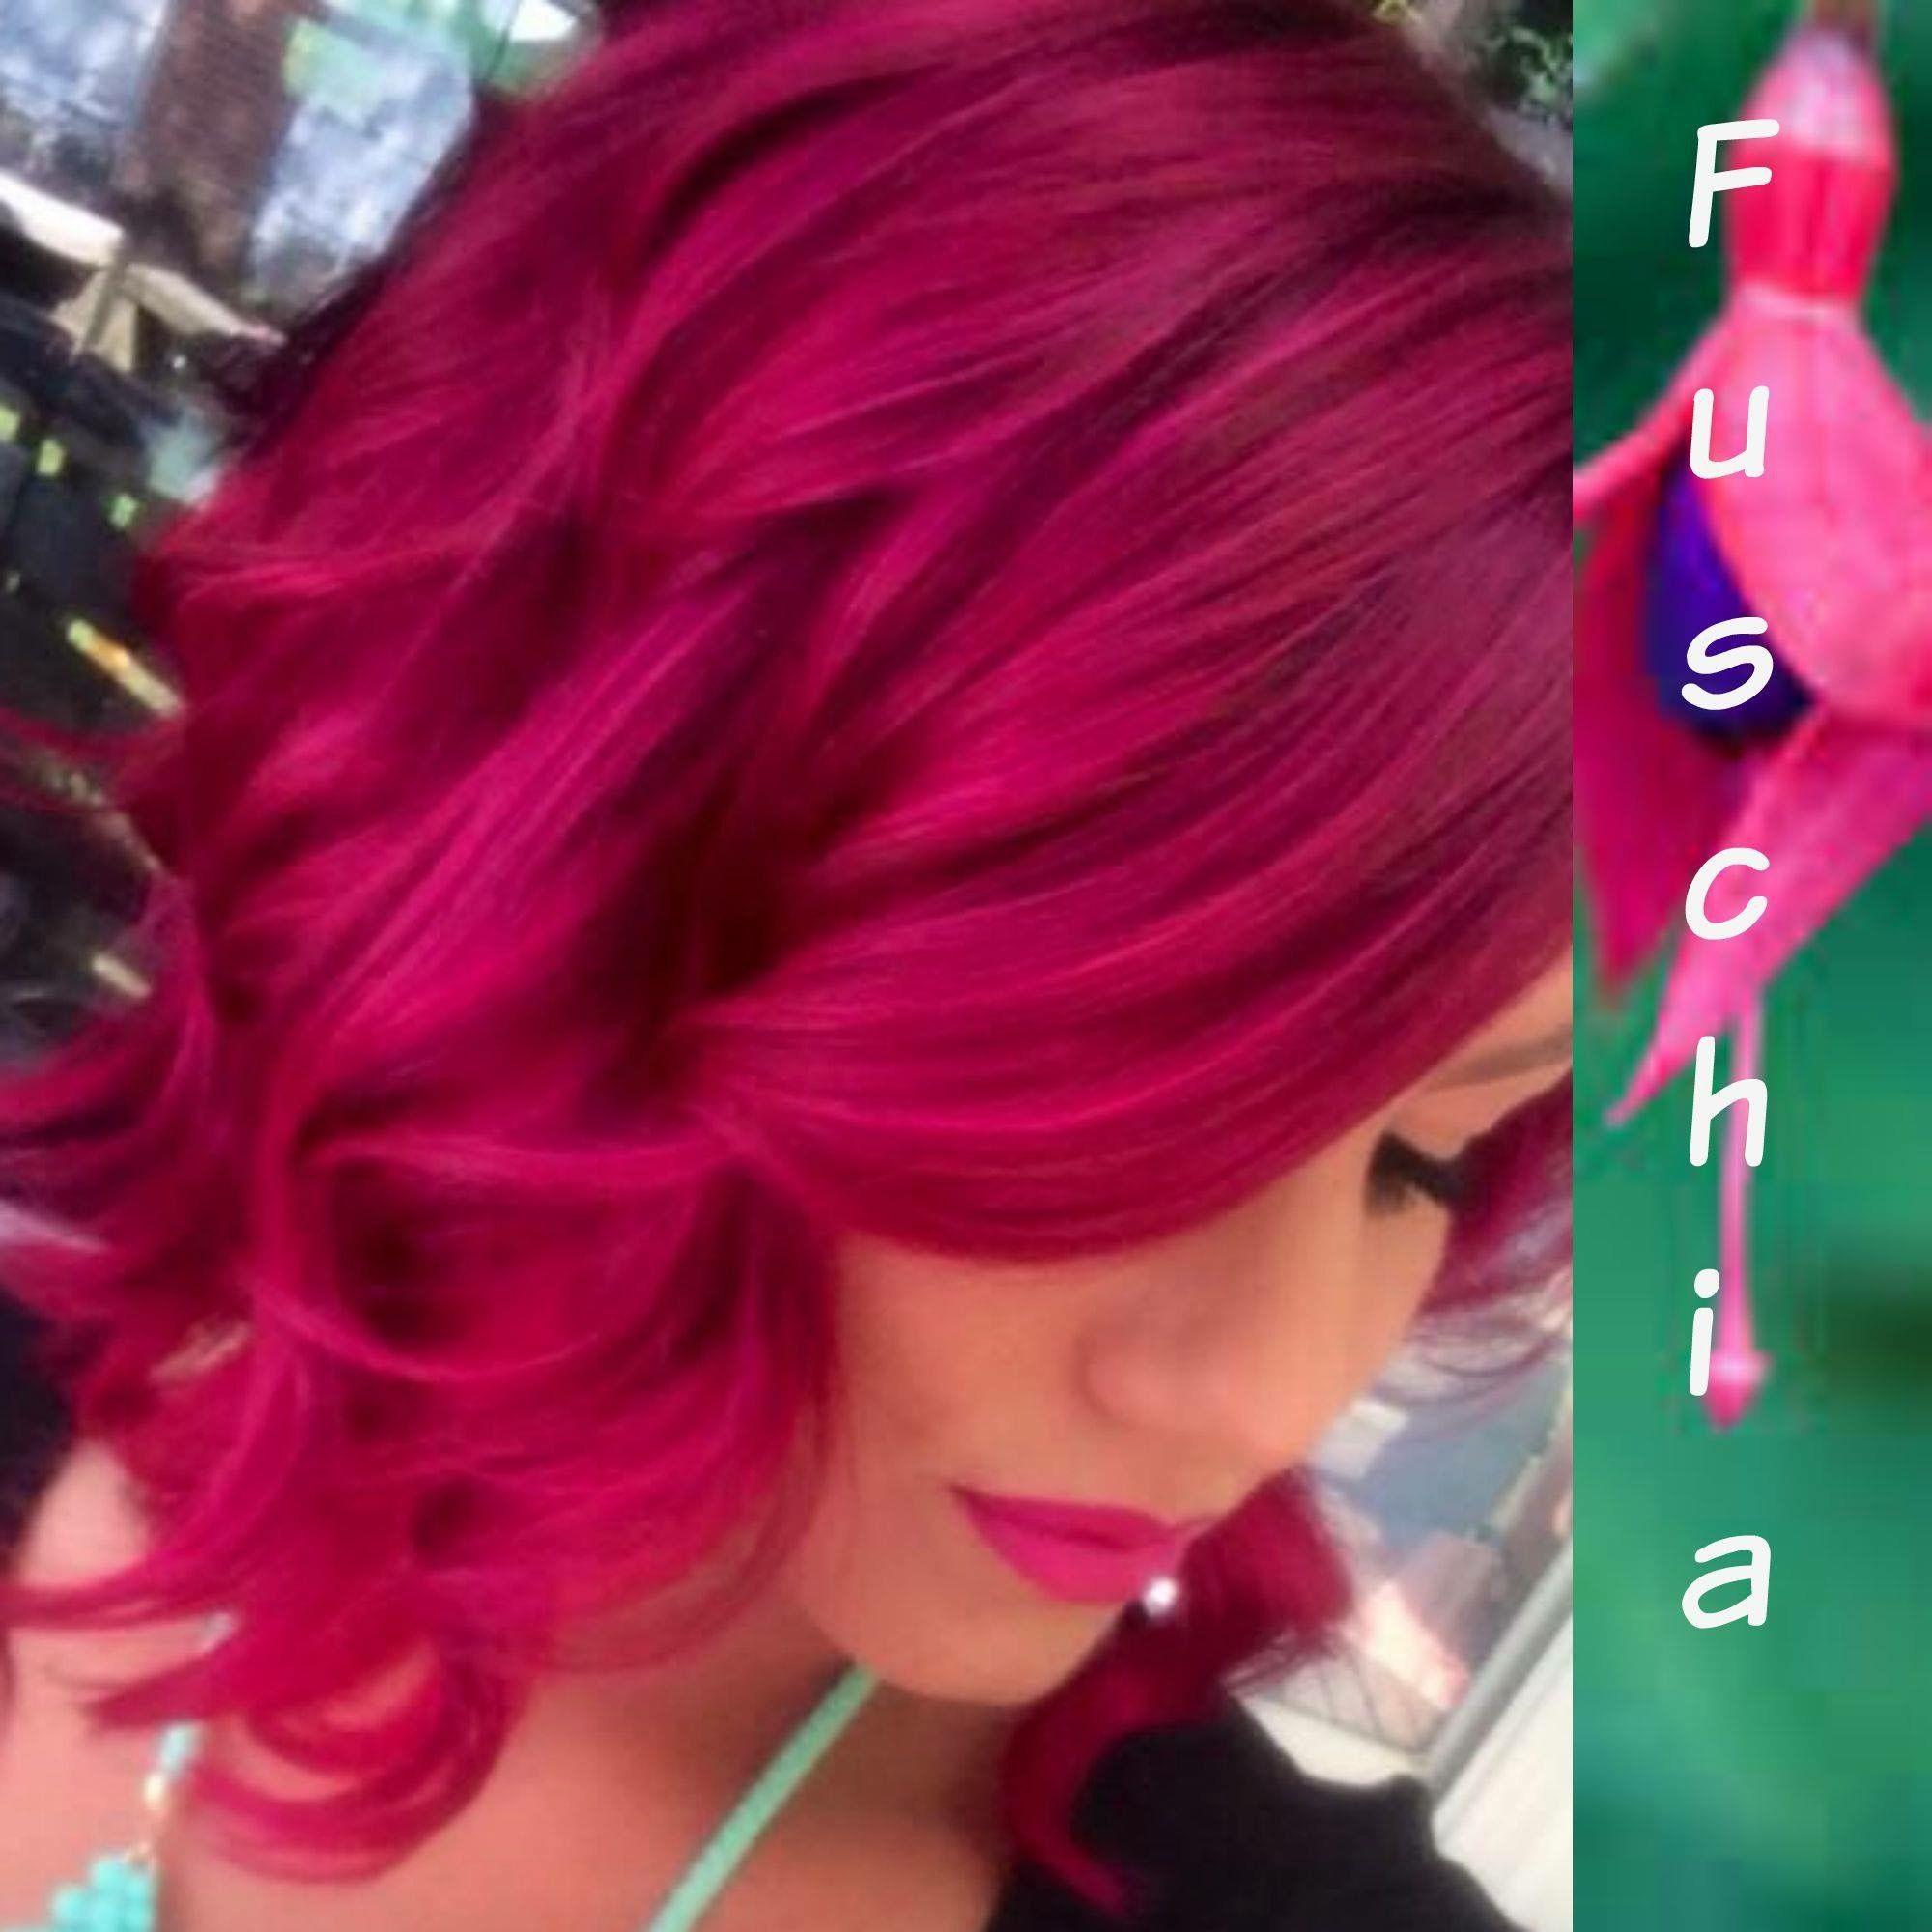 Pin by cherisha ferrigno on hair colors pinterest hair coloring